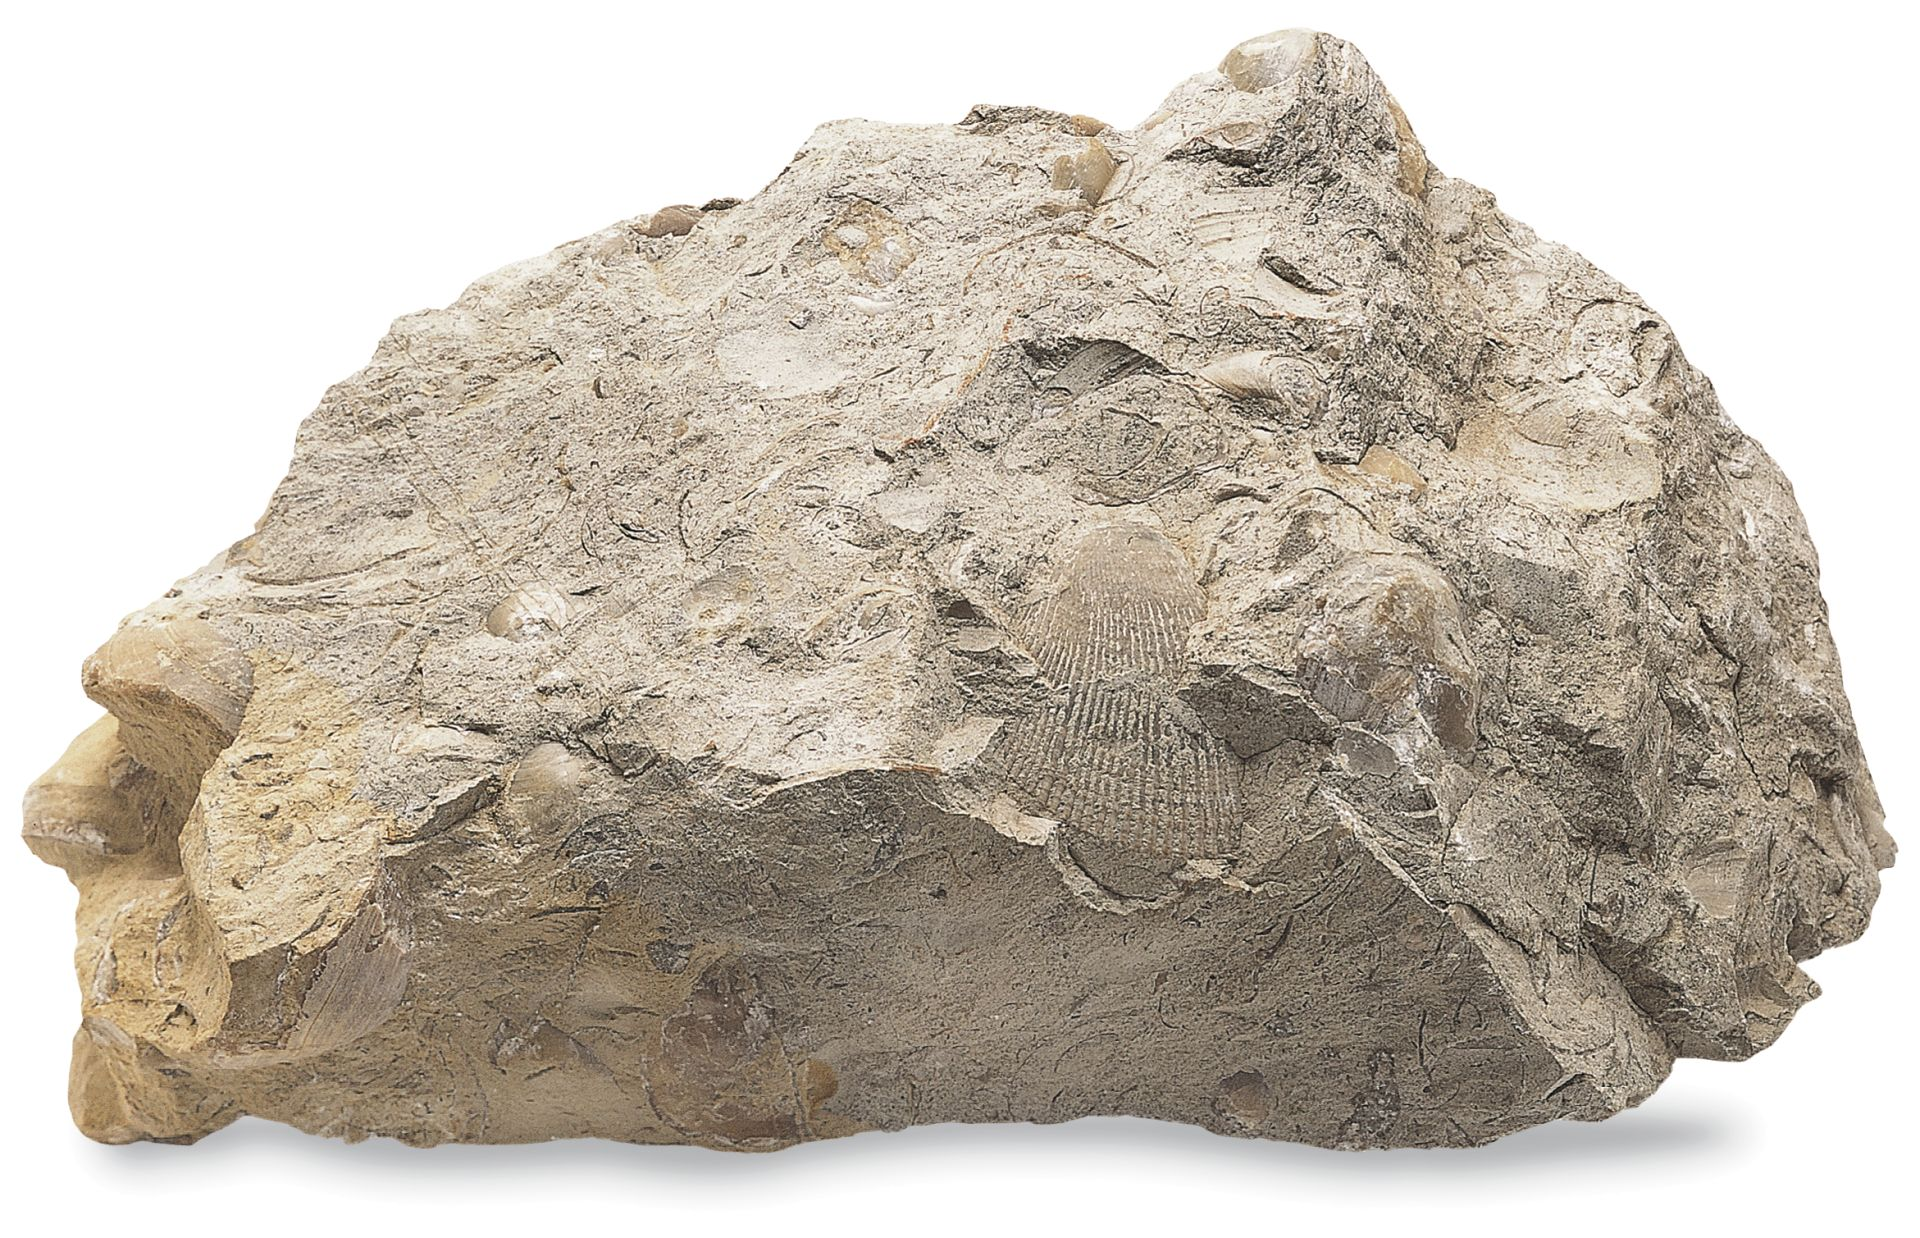 Limestone Sedimentary Rock : Sedimentary rocks types of dk find out